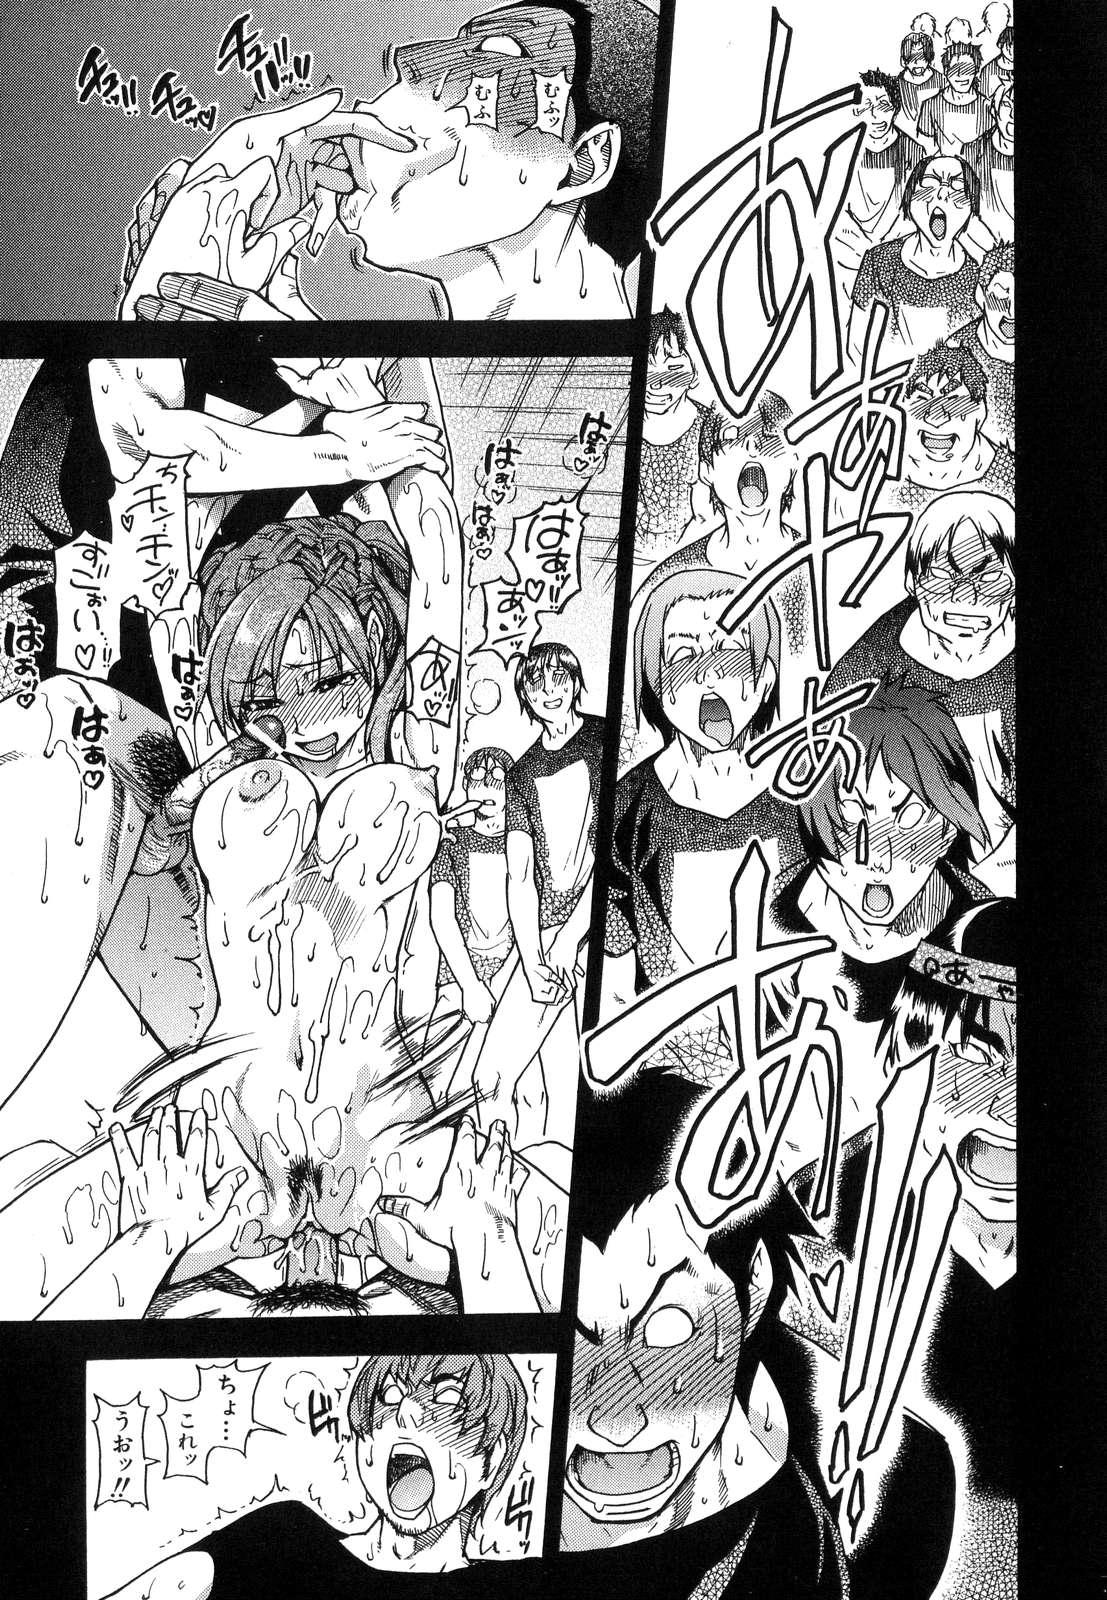 Shining Musume. 6. Rainbow Six 85